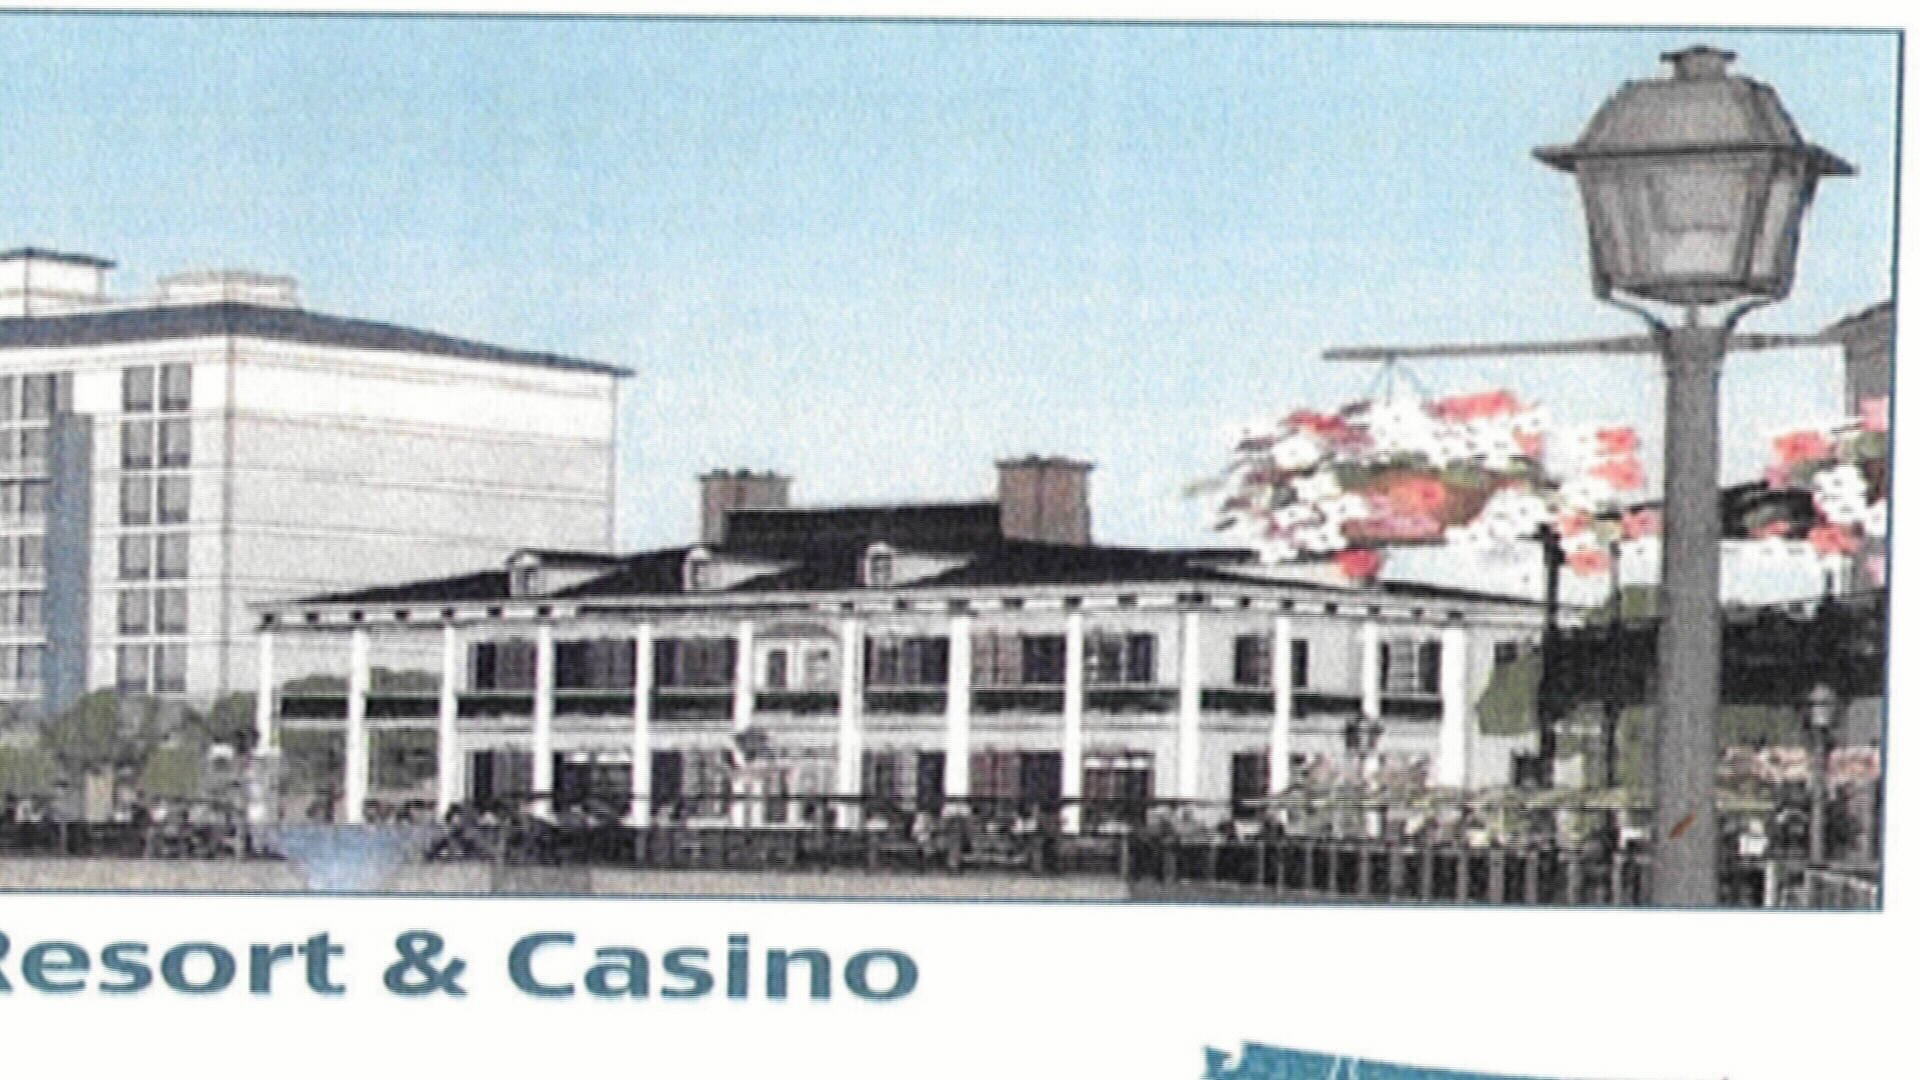 New casino in kansas play for fun casino games offline